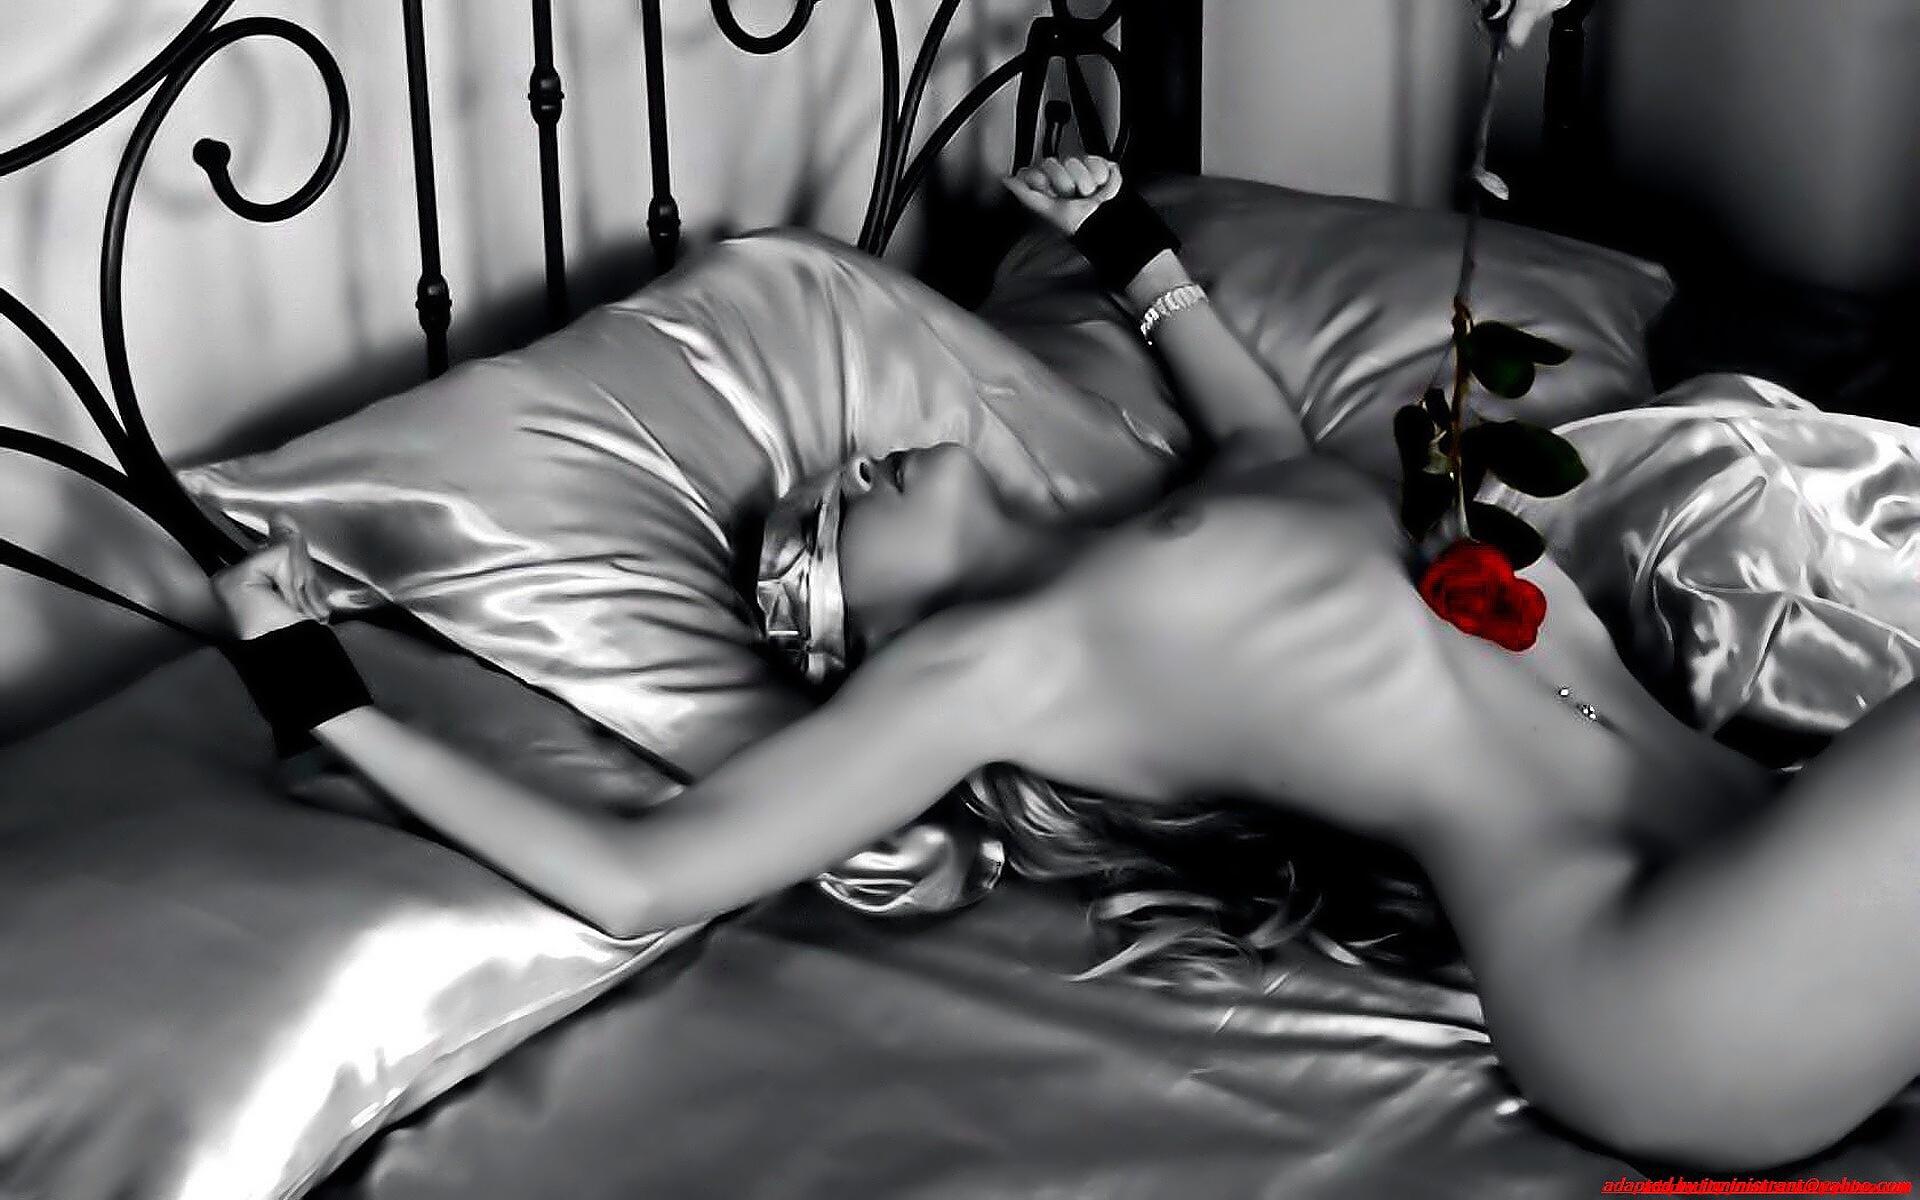 video-privyazannie-devushki-seksualnie-pizdu